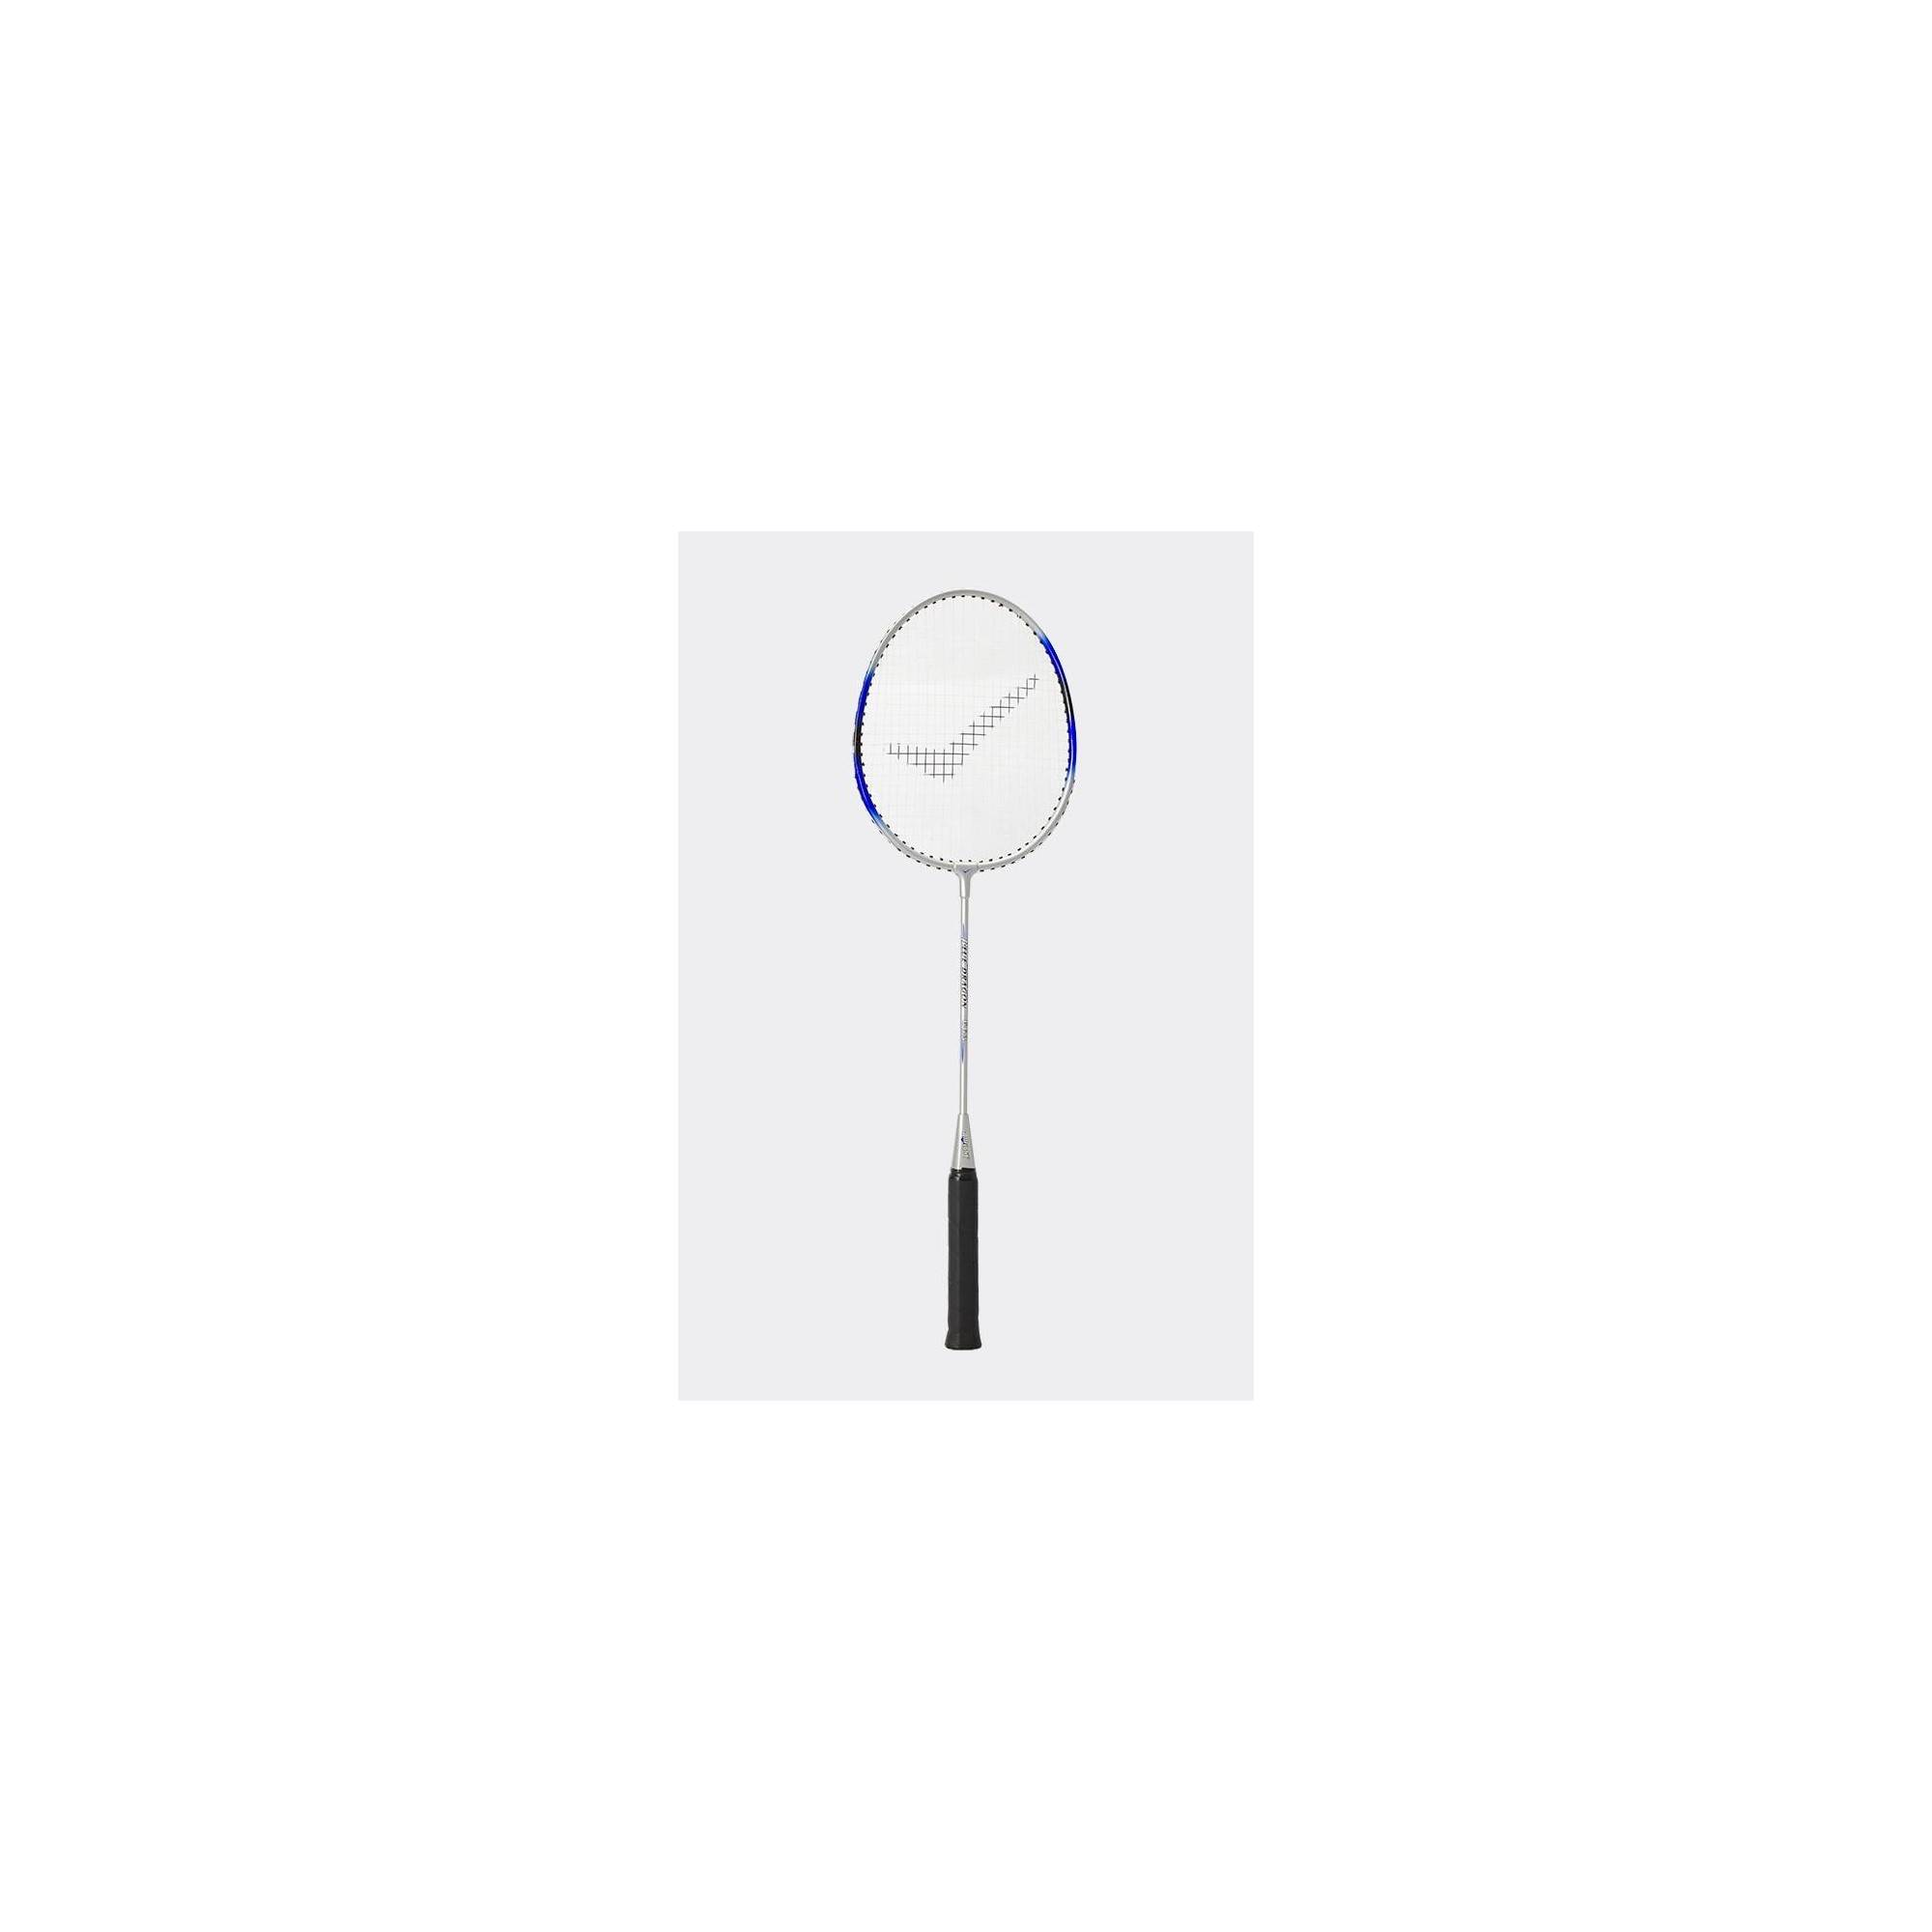 Rakieta badminton Allright Blue Dragon 663 | pokrowiec 1/2 ALLRIGHT - 1 | klubfitness.pl